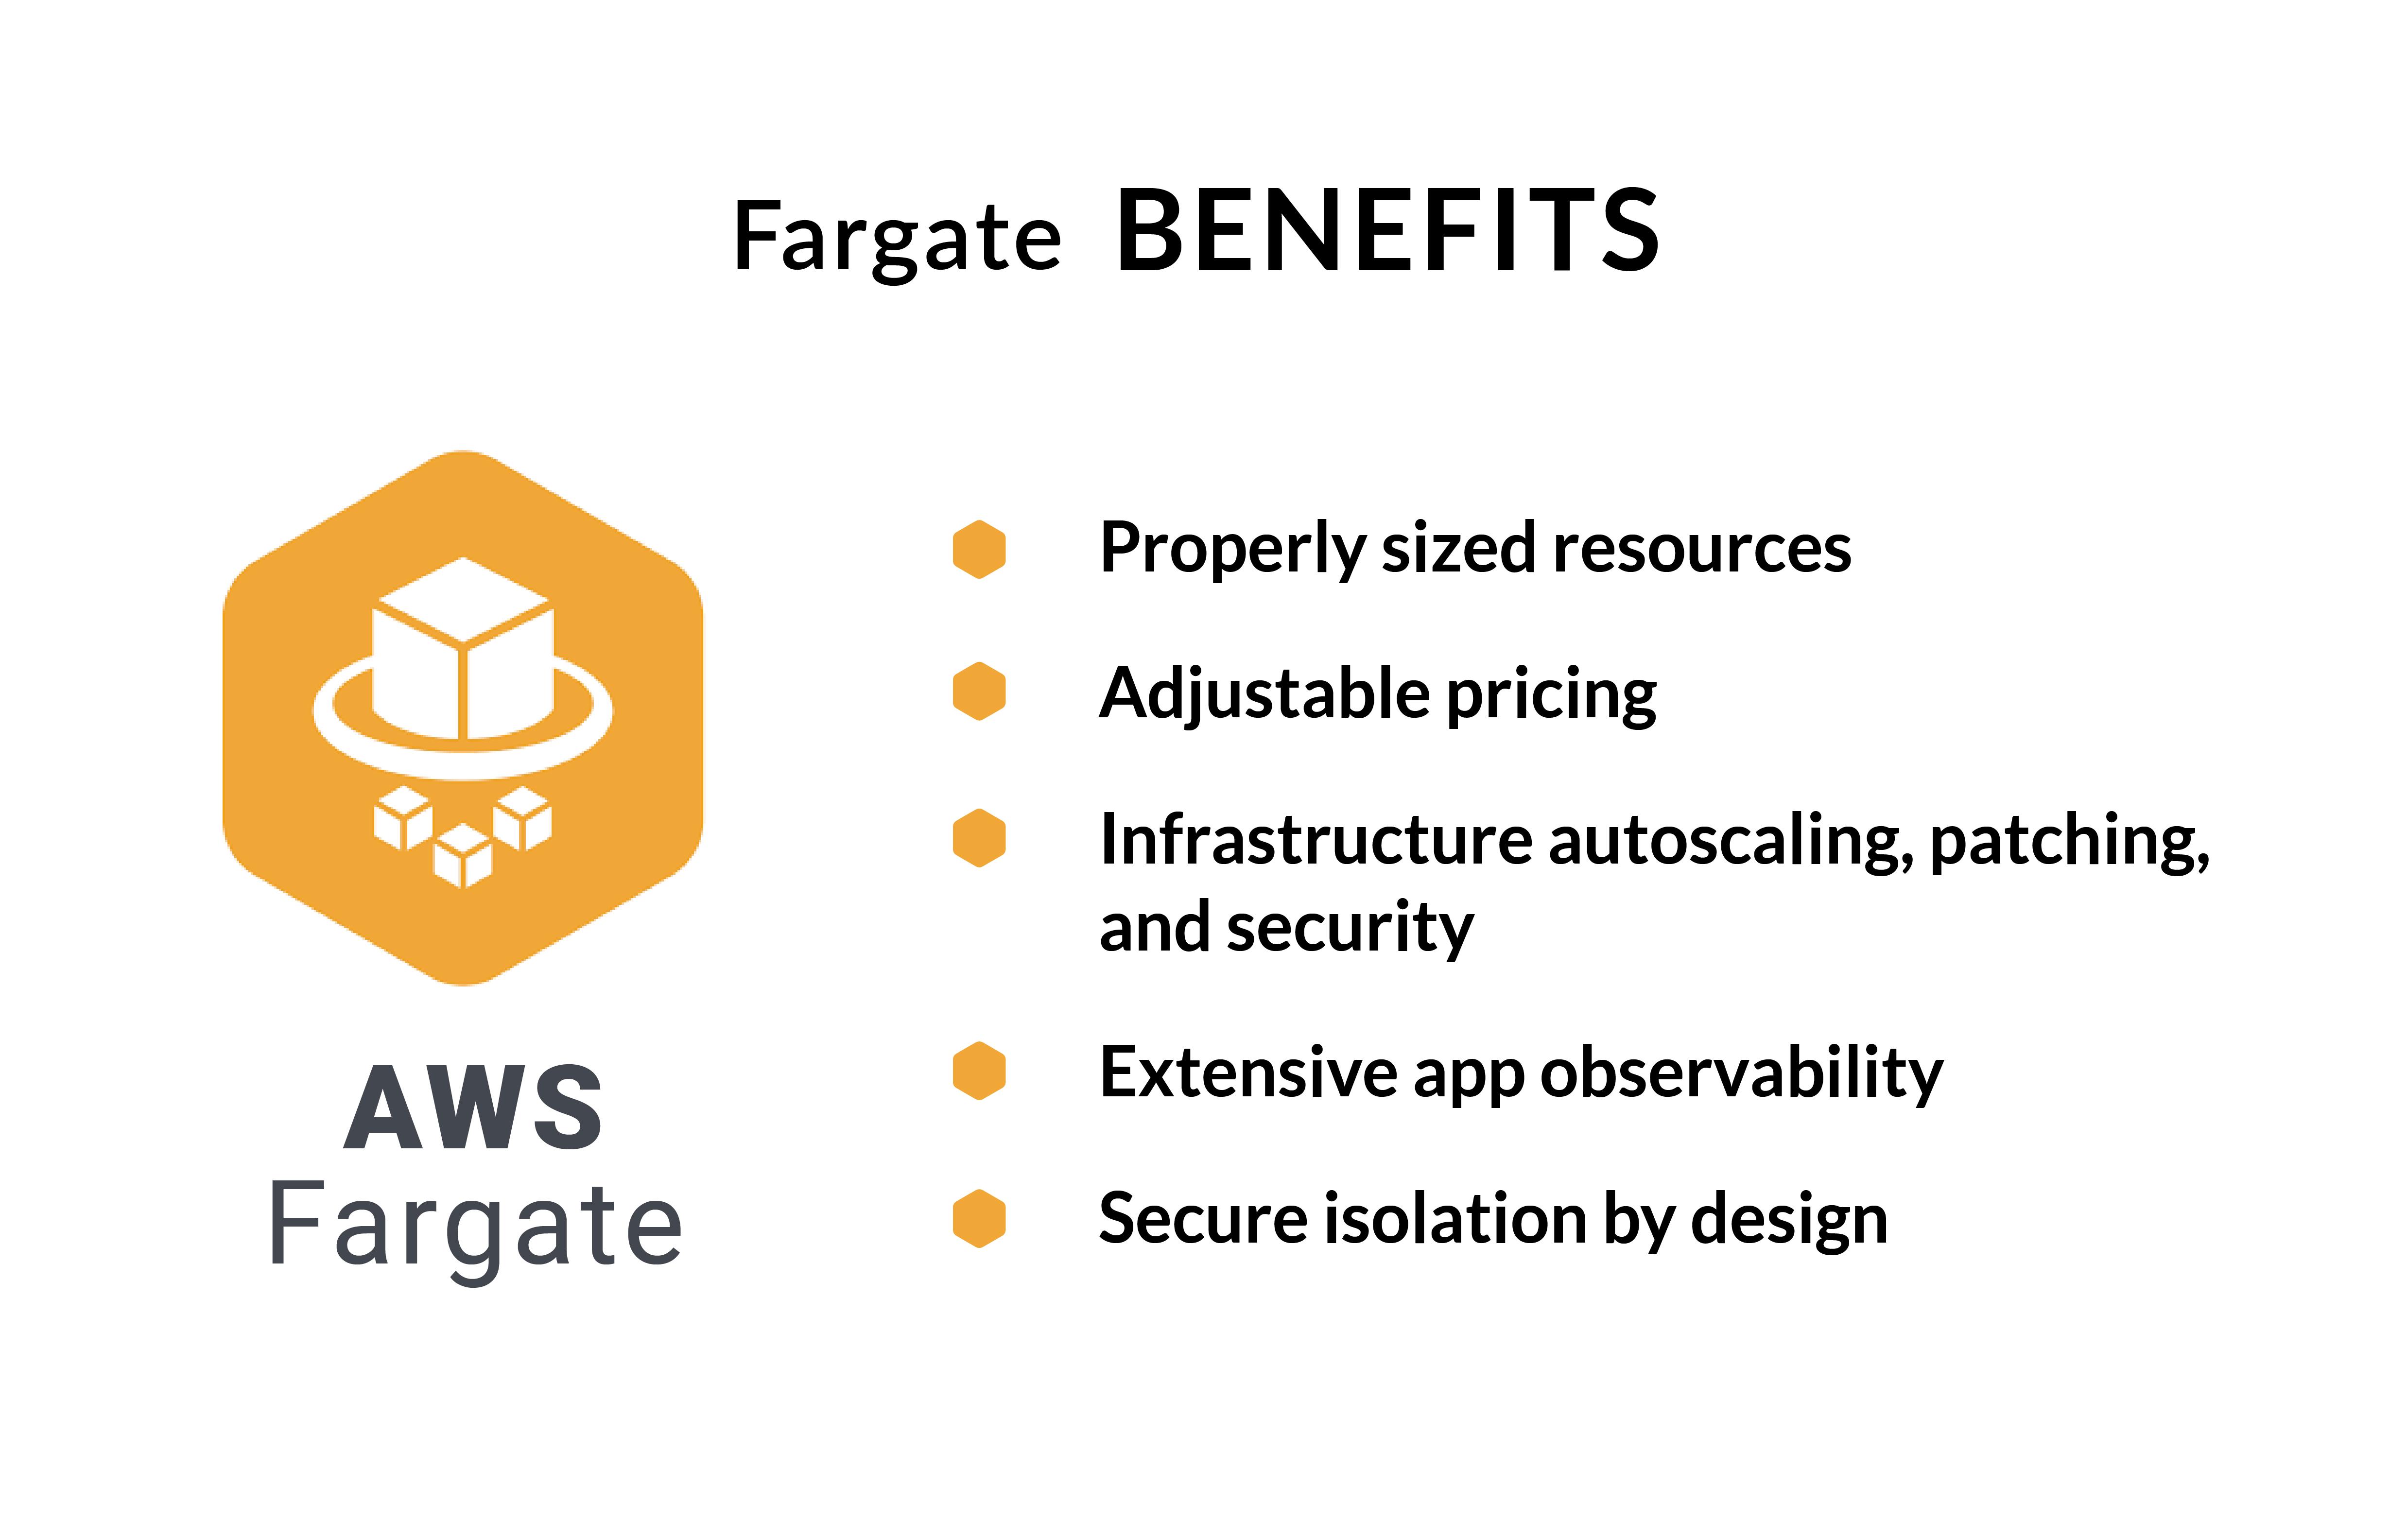 Fargate benefits